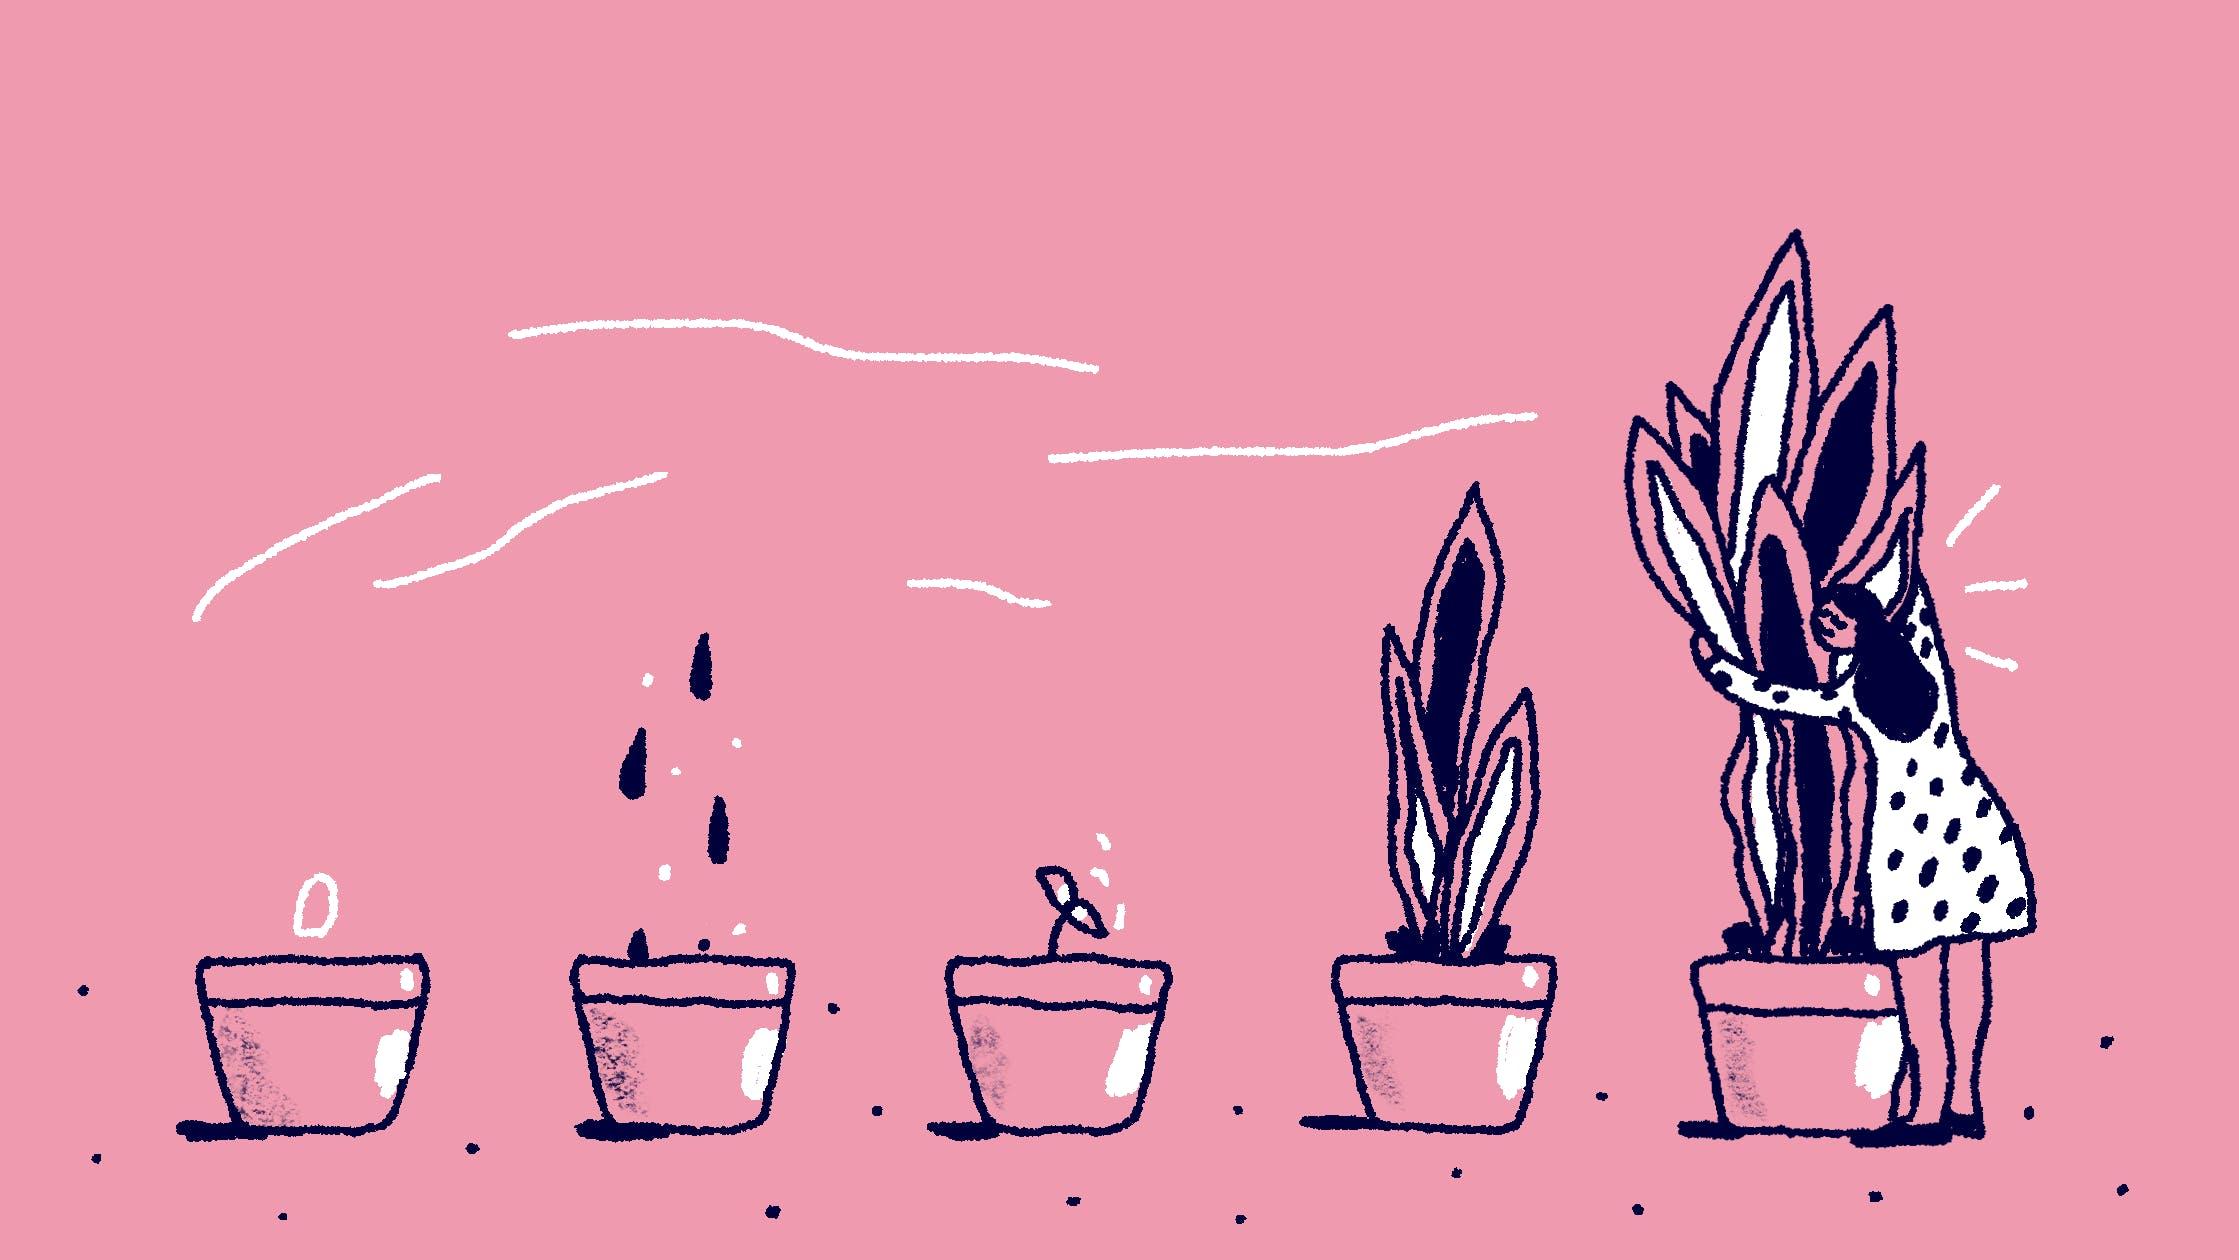 Illustration by Saskia Keultjes